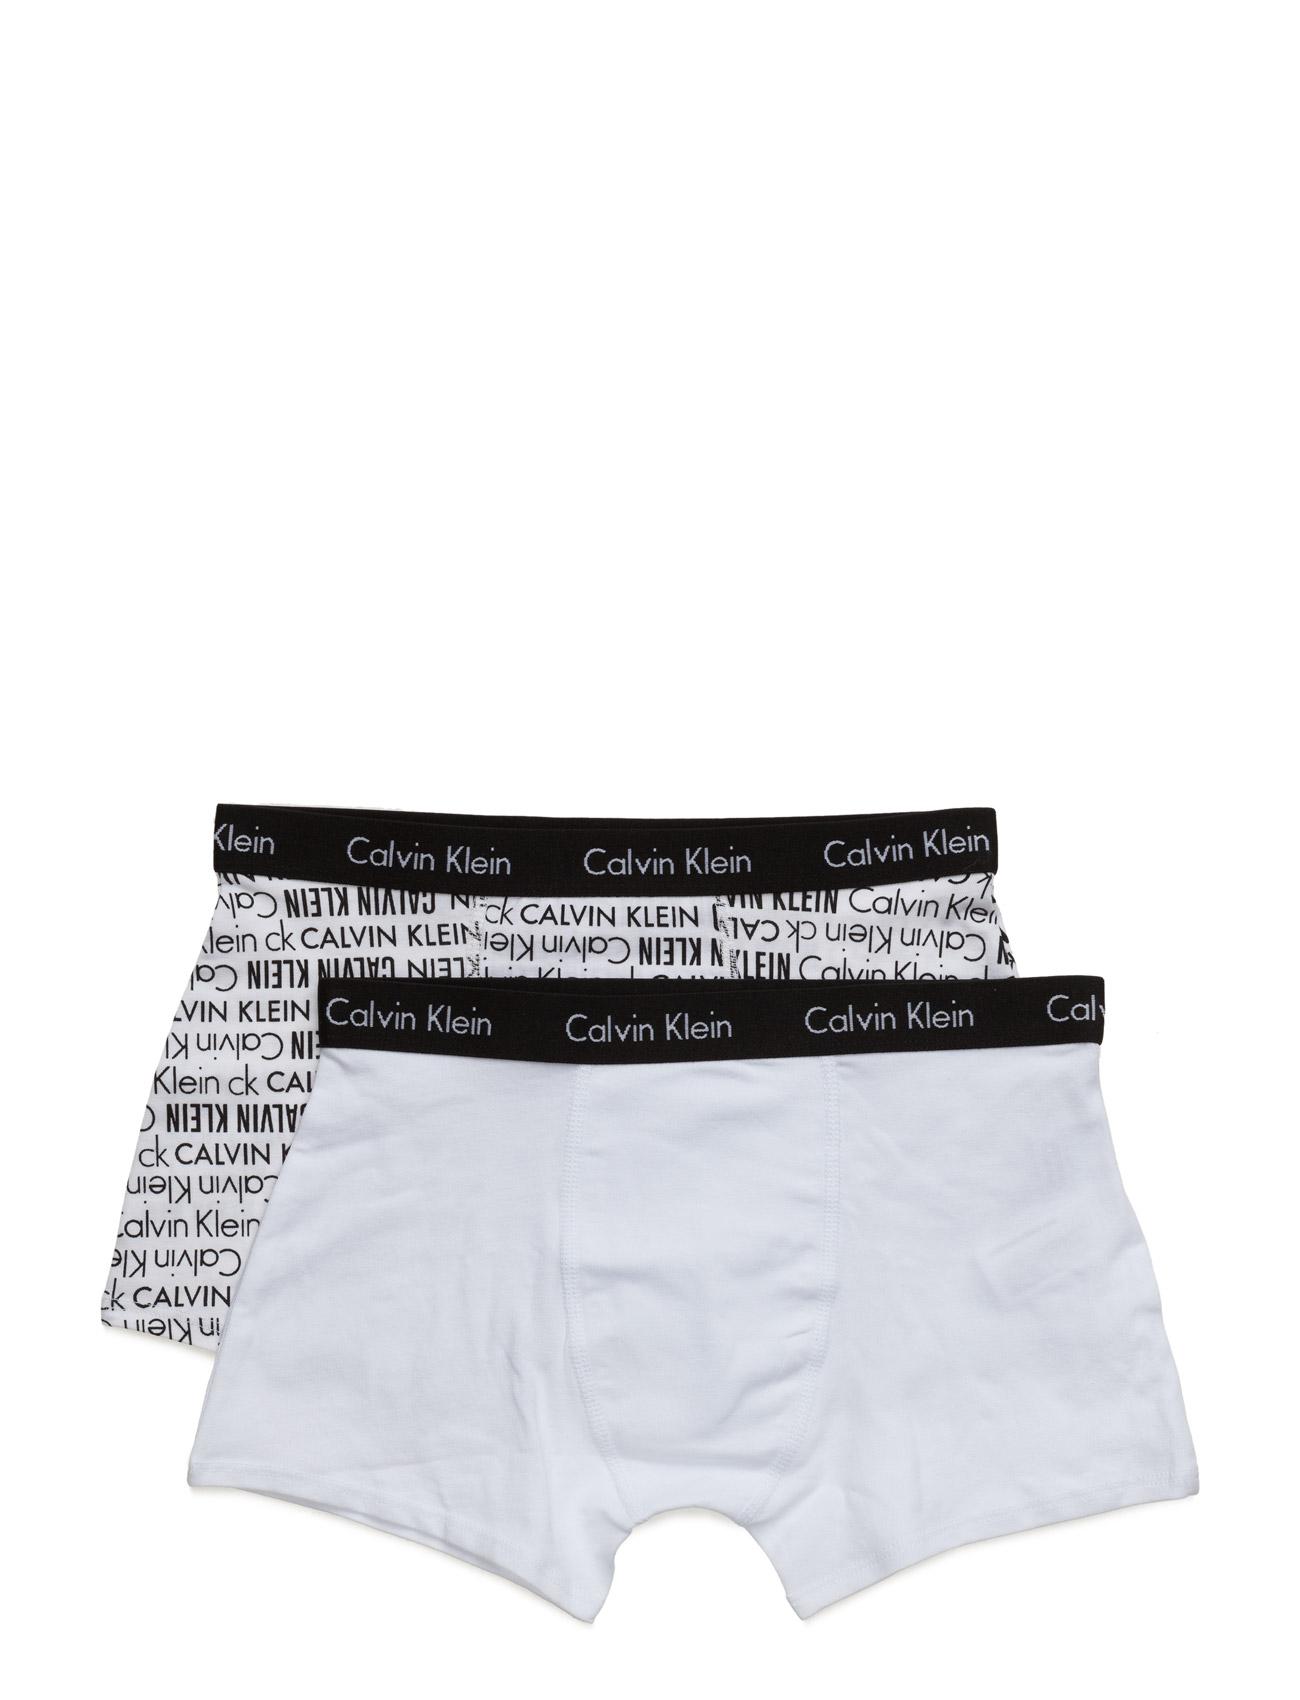 2pk Trunk Calvin Klein Kids Nat & Undertøj til Drenge i hvid